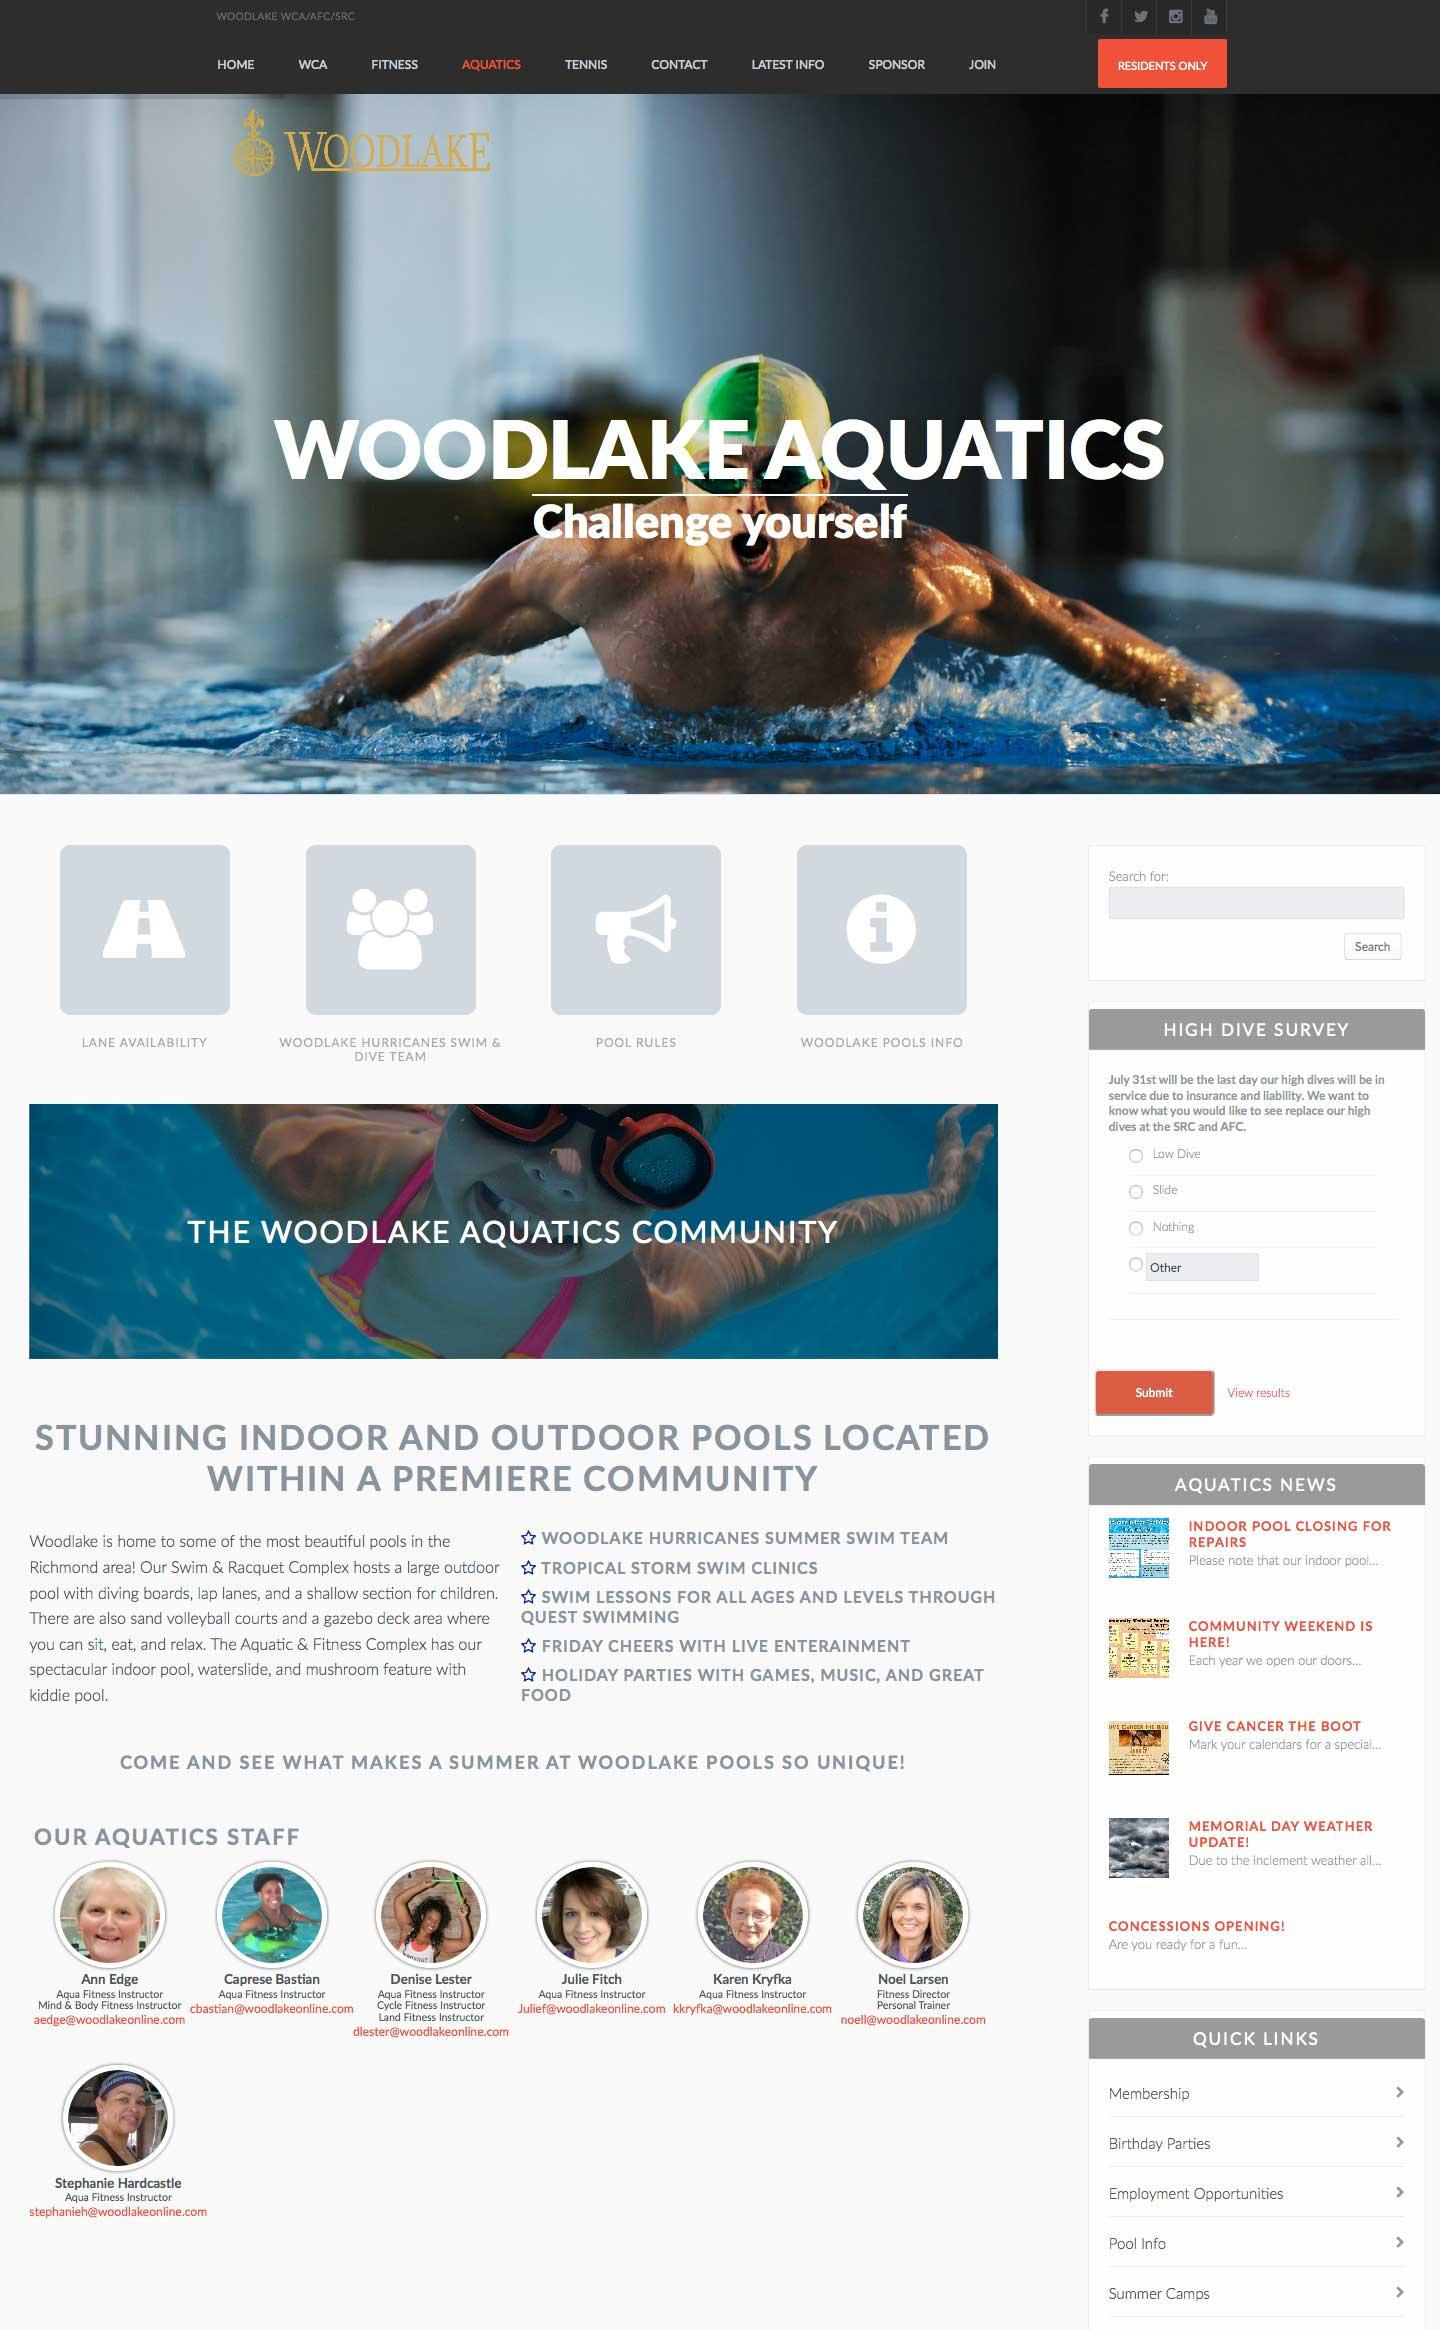 122-woodlake-aquatics